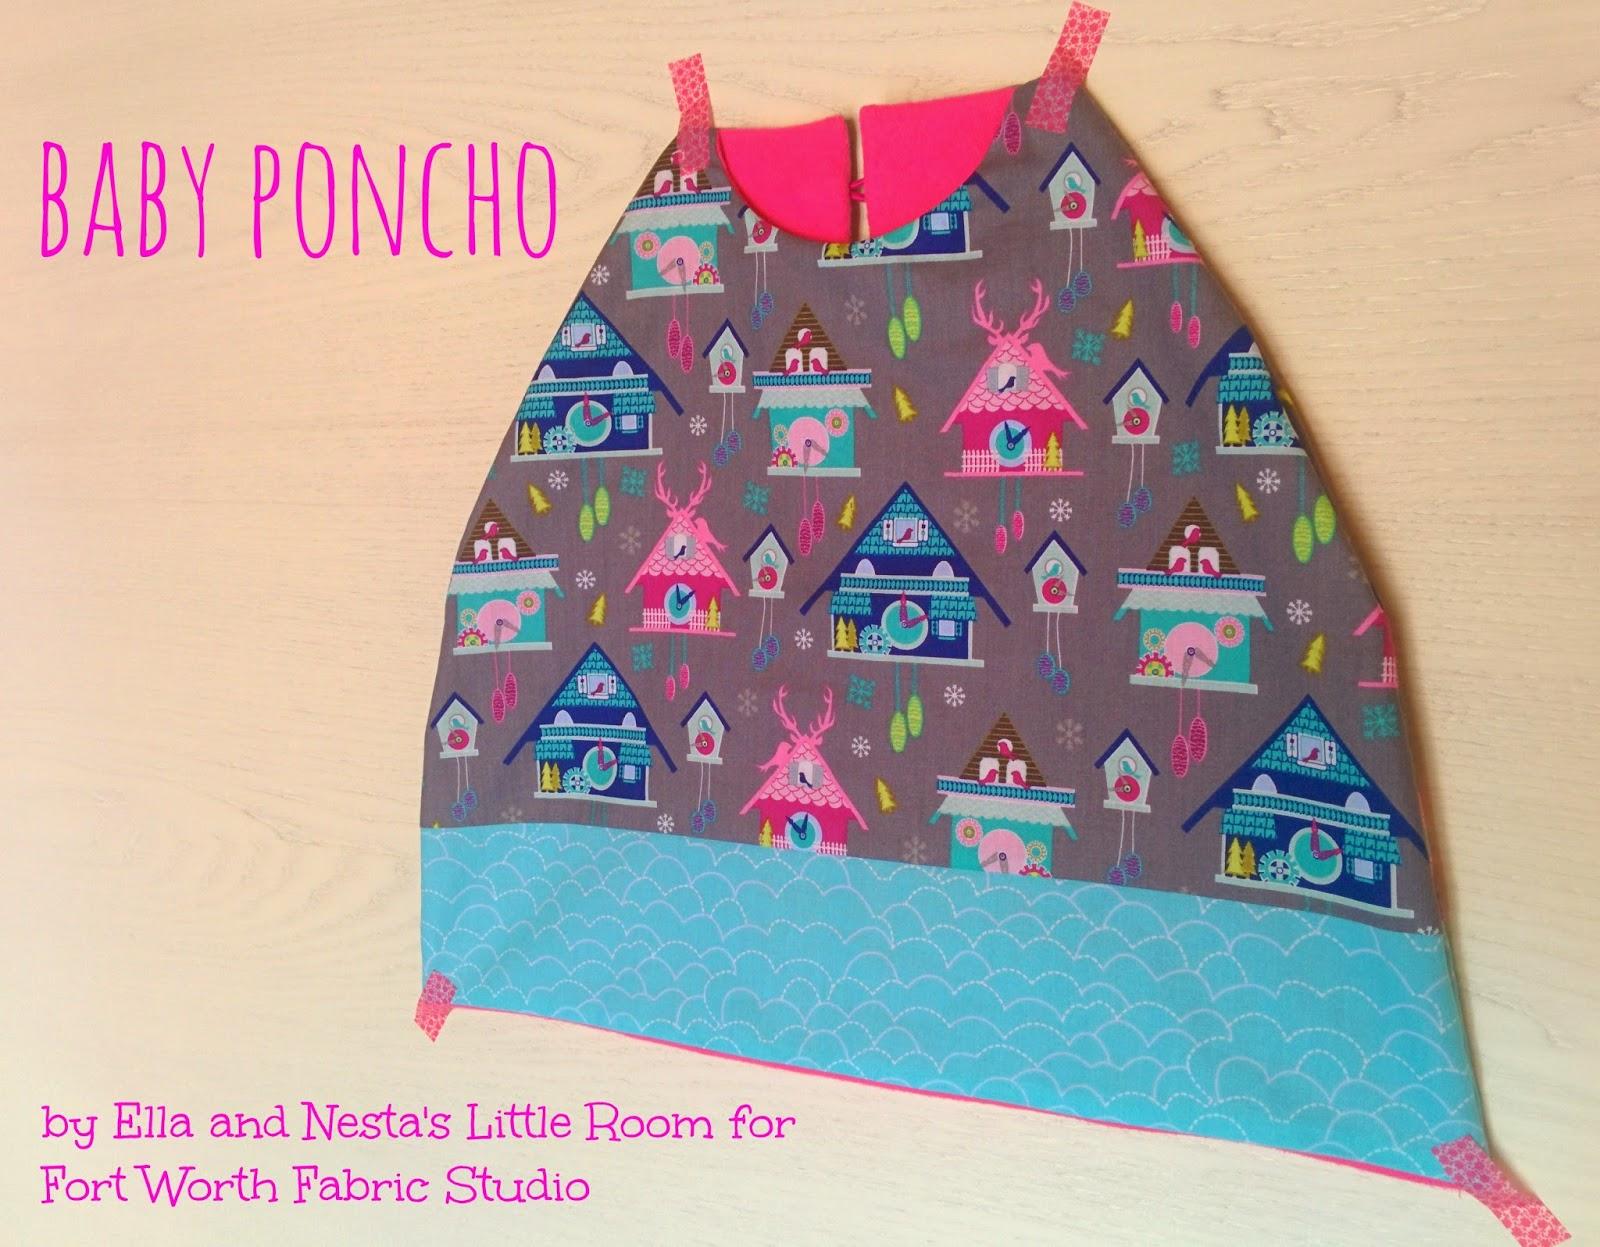 Fort Worth Fabric Studio: Baby Poncho Tutorial